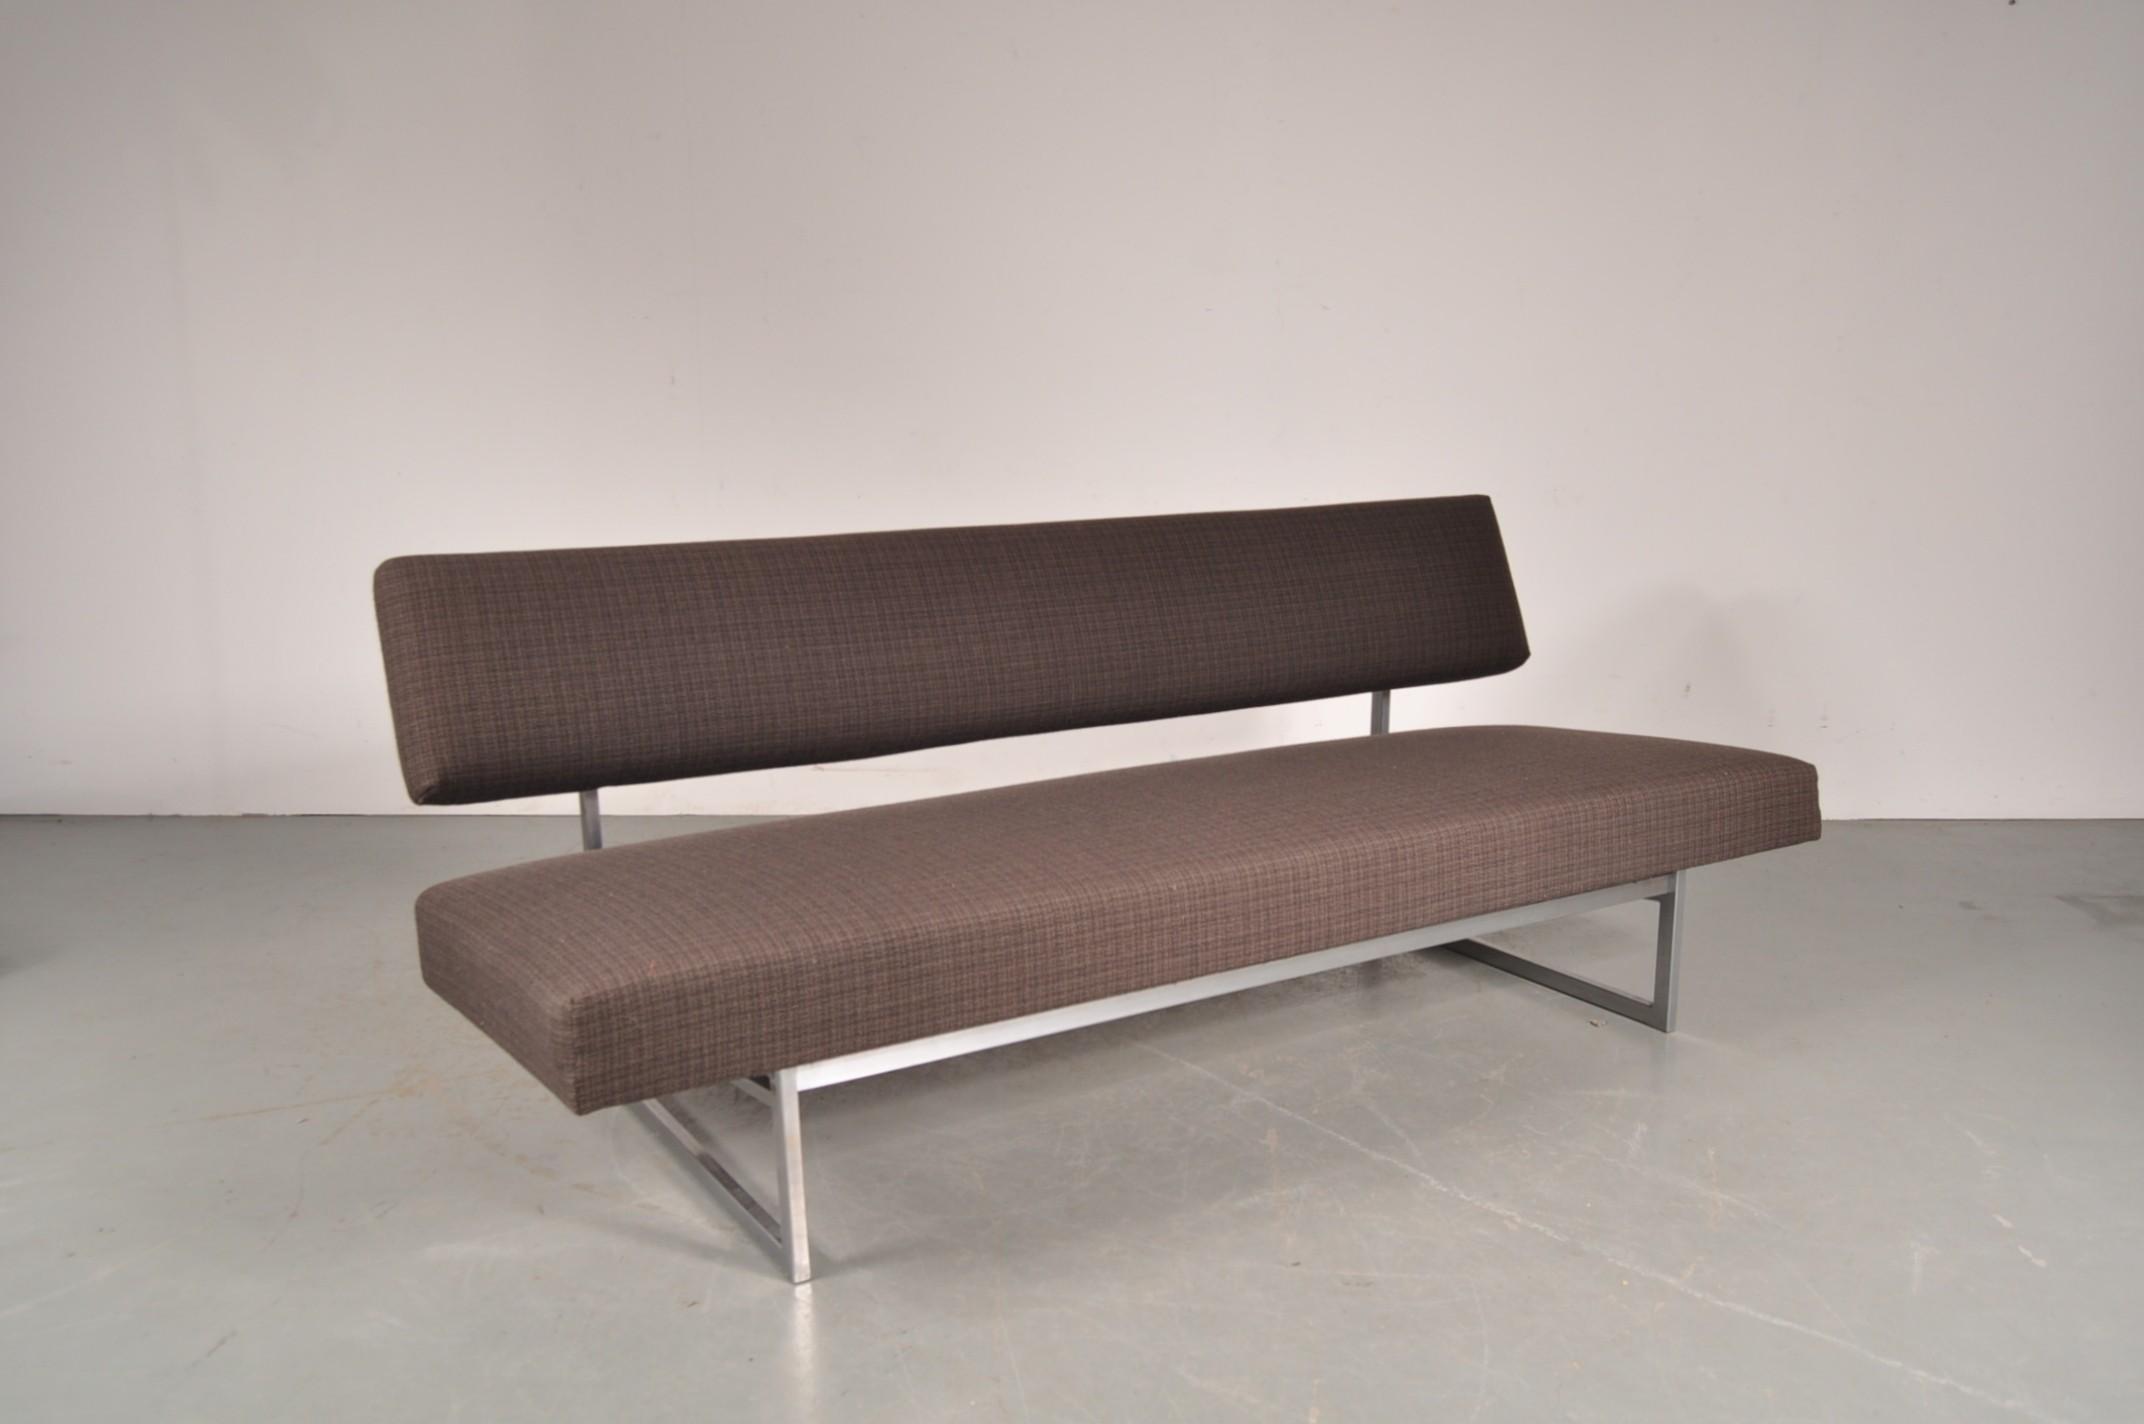 Gelderland 3 seaters brown sleeping sofa Rob PARRY 1960s